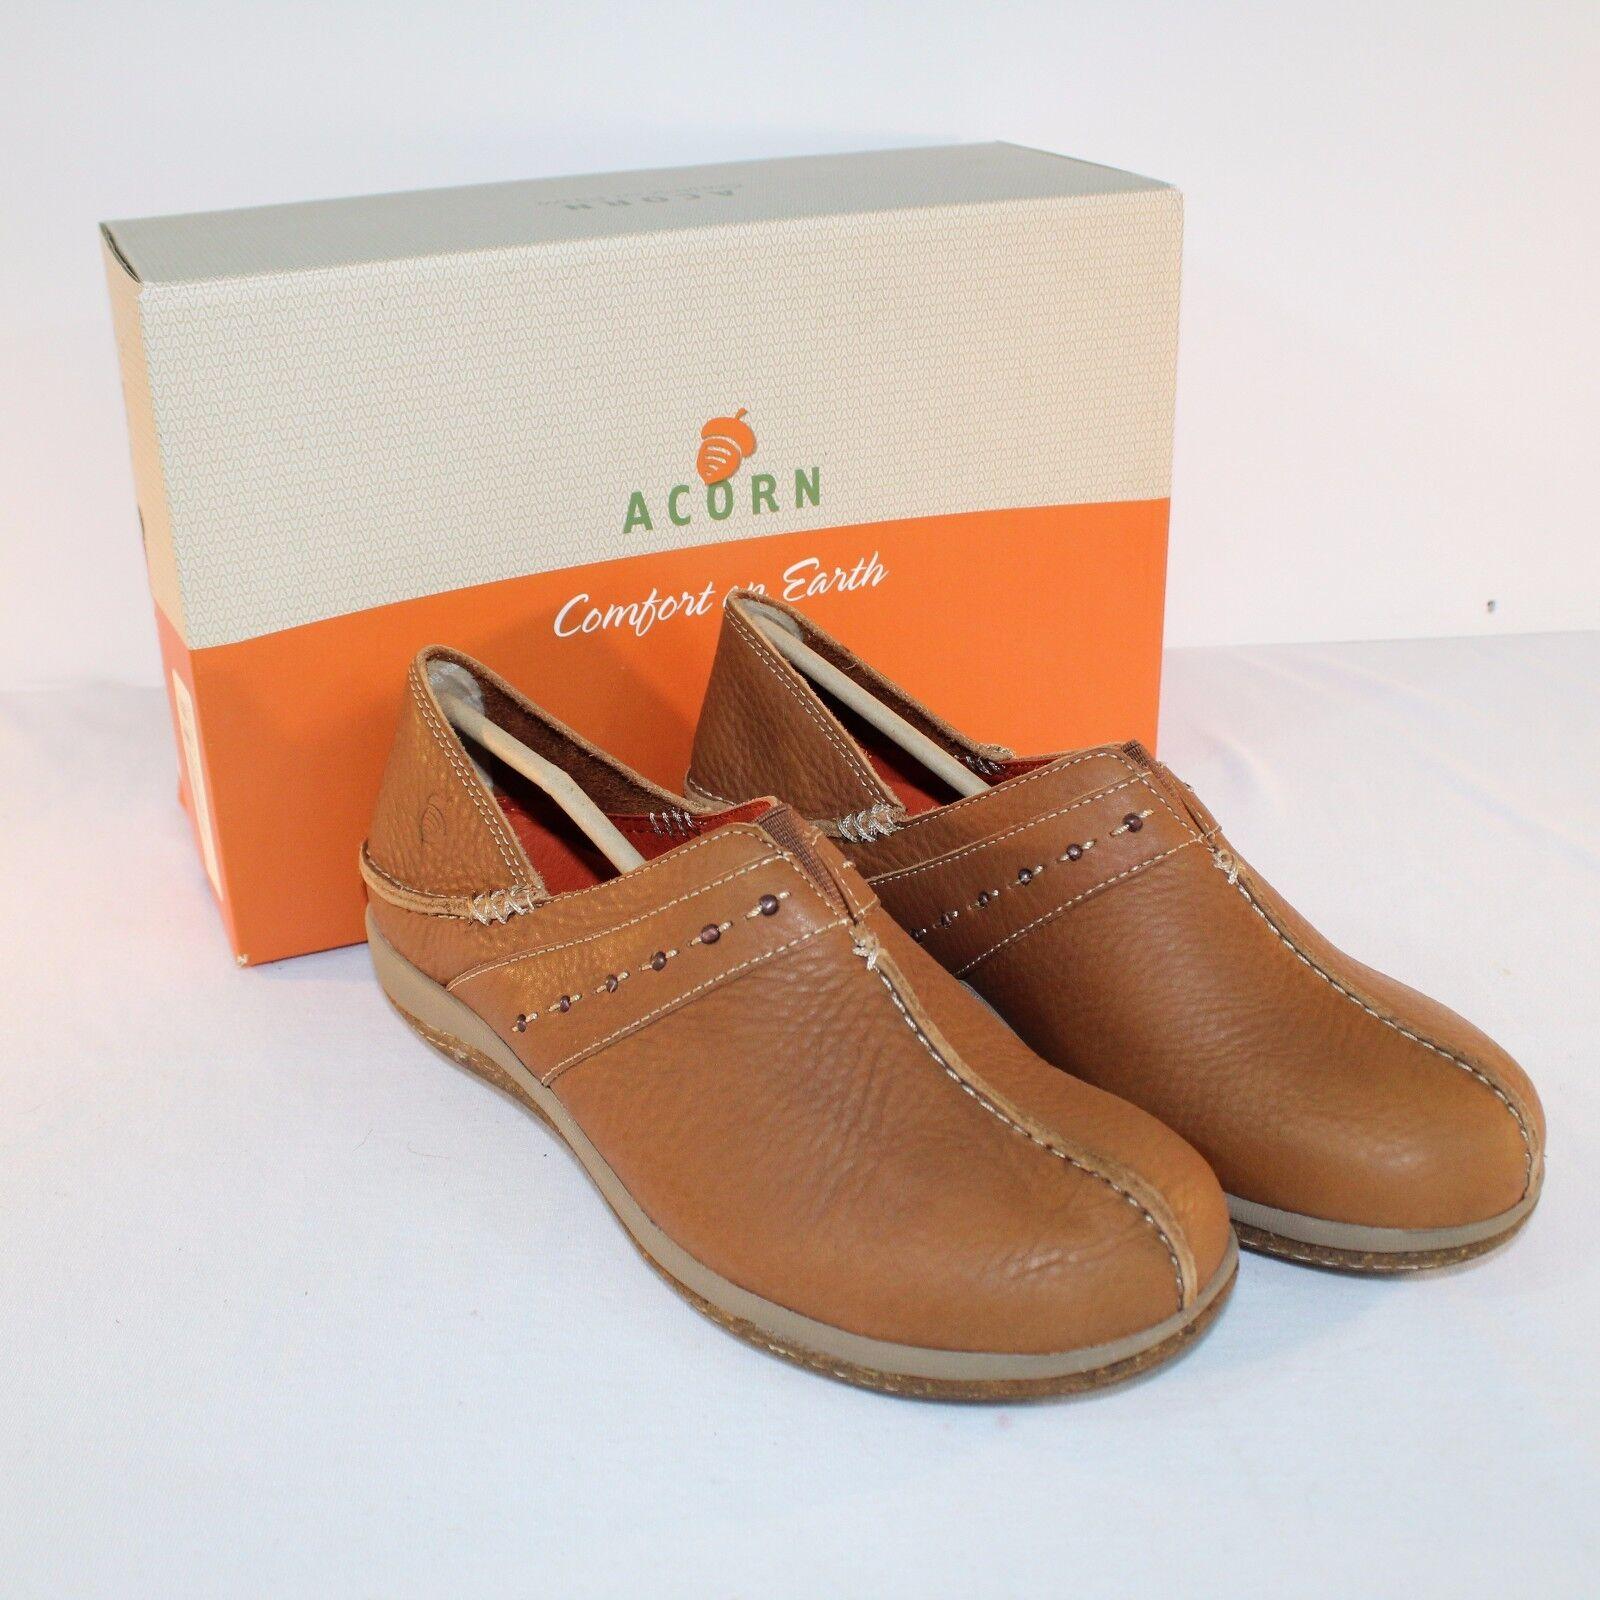 Acorn C2G Lite Moc Whiskey Marronee Leather Slip On Moccasin scarpe Dimensione 6